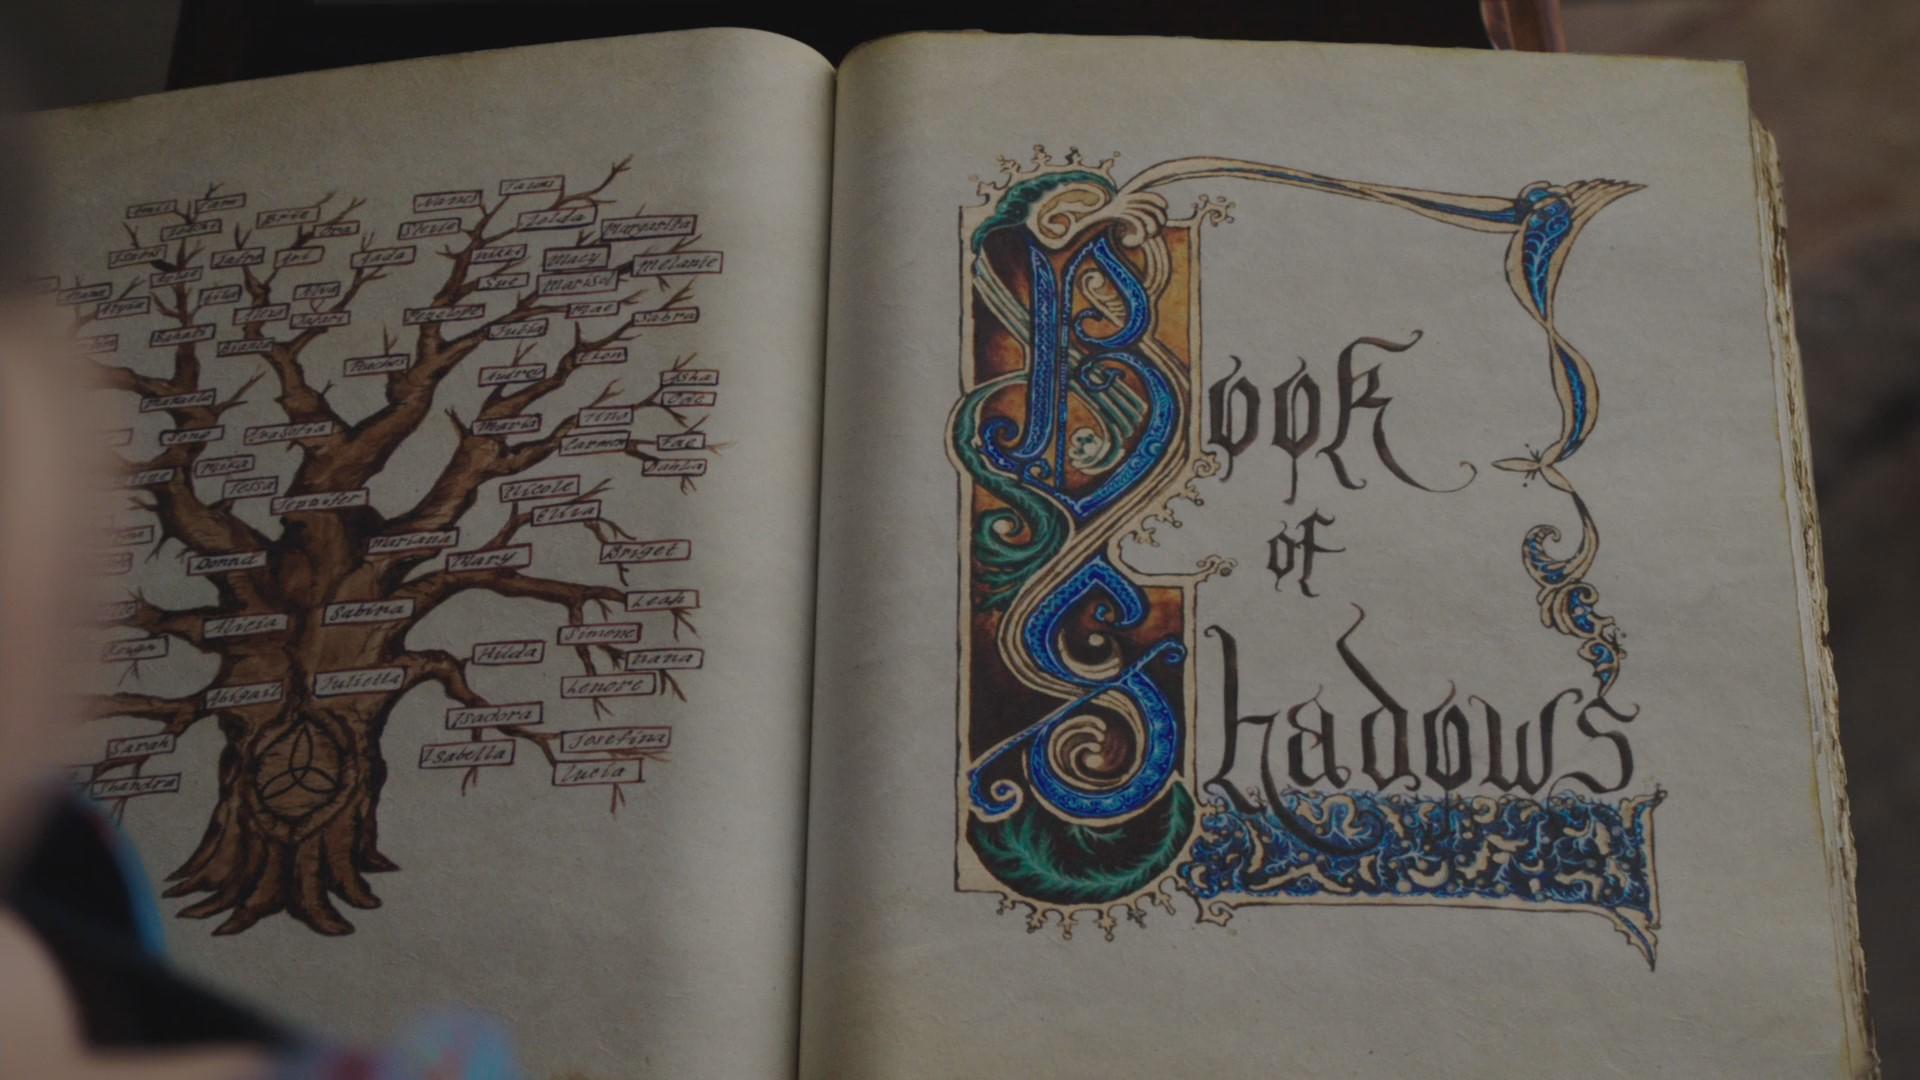 Book of Shadows | Charmed Wiki | FANDOM powered by Wikia